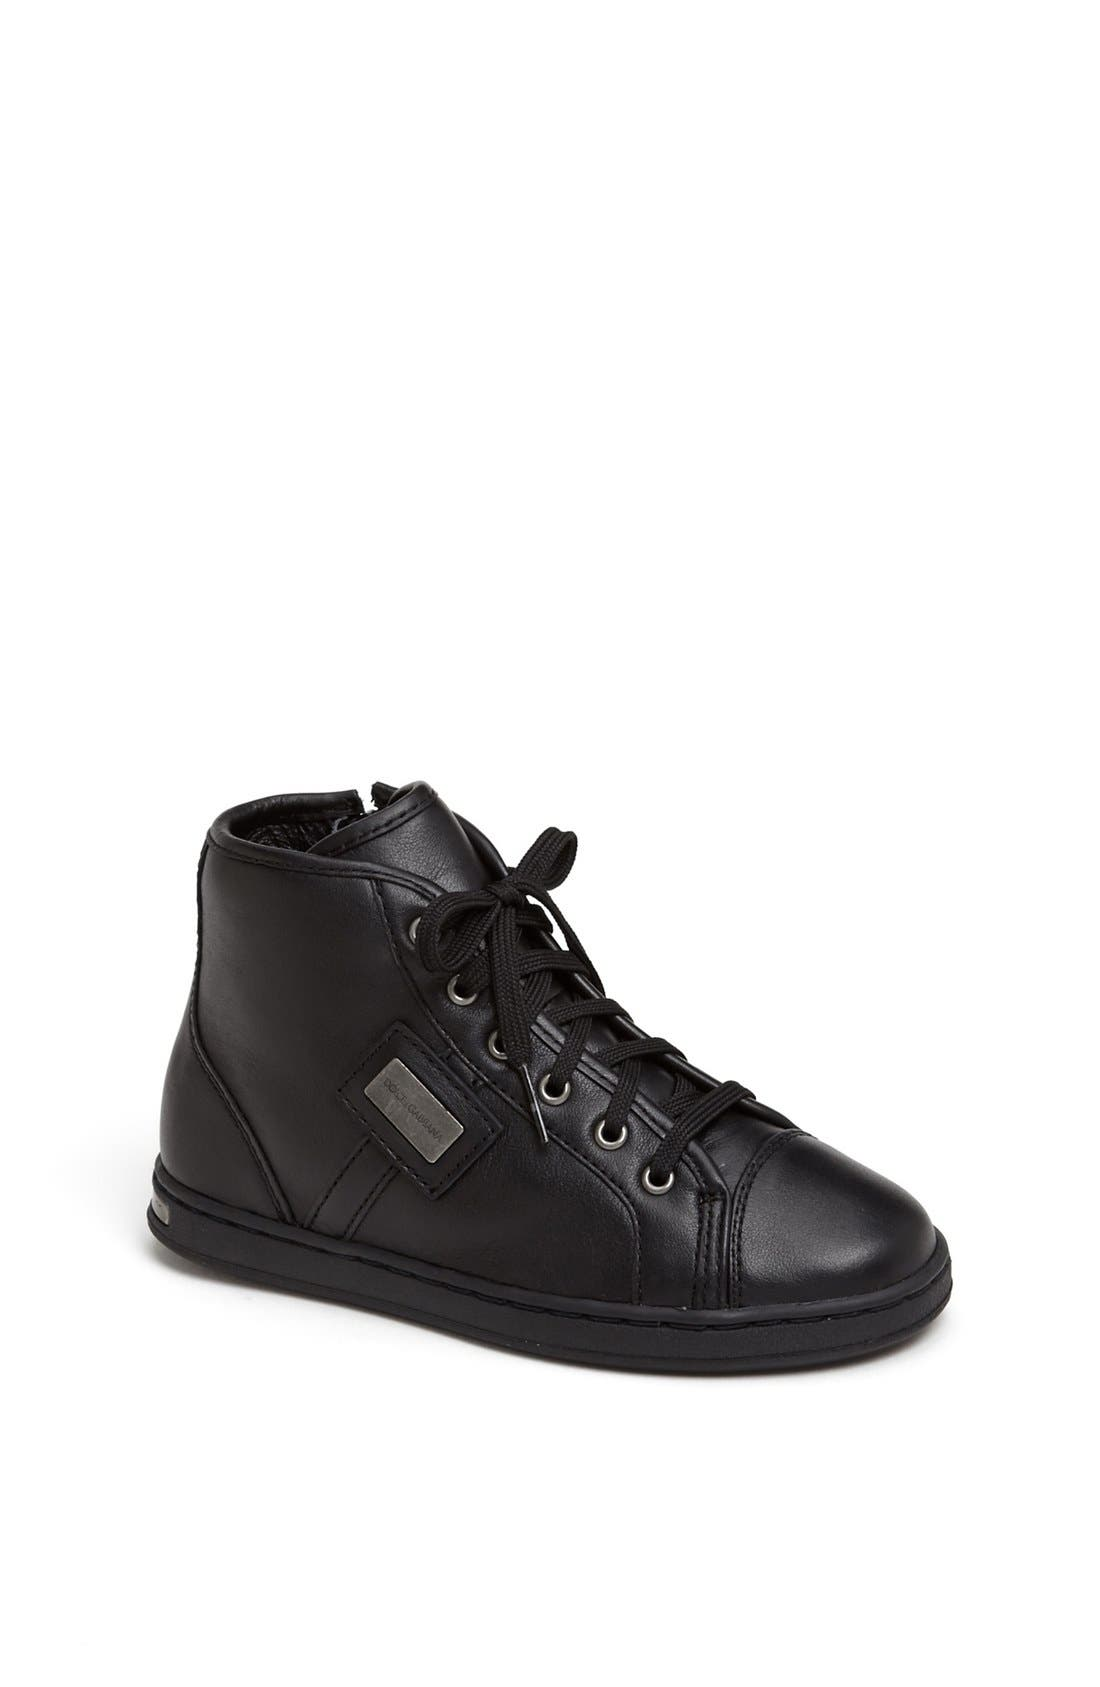 Main Image - Dolce&Gabbana High Top Sneaker (Toddler & Little Kid)